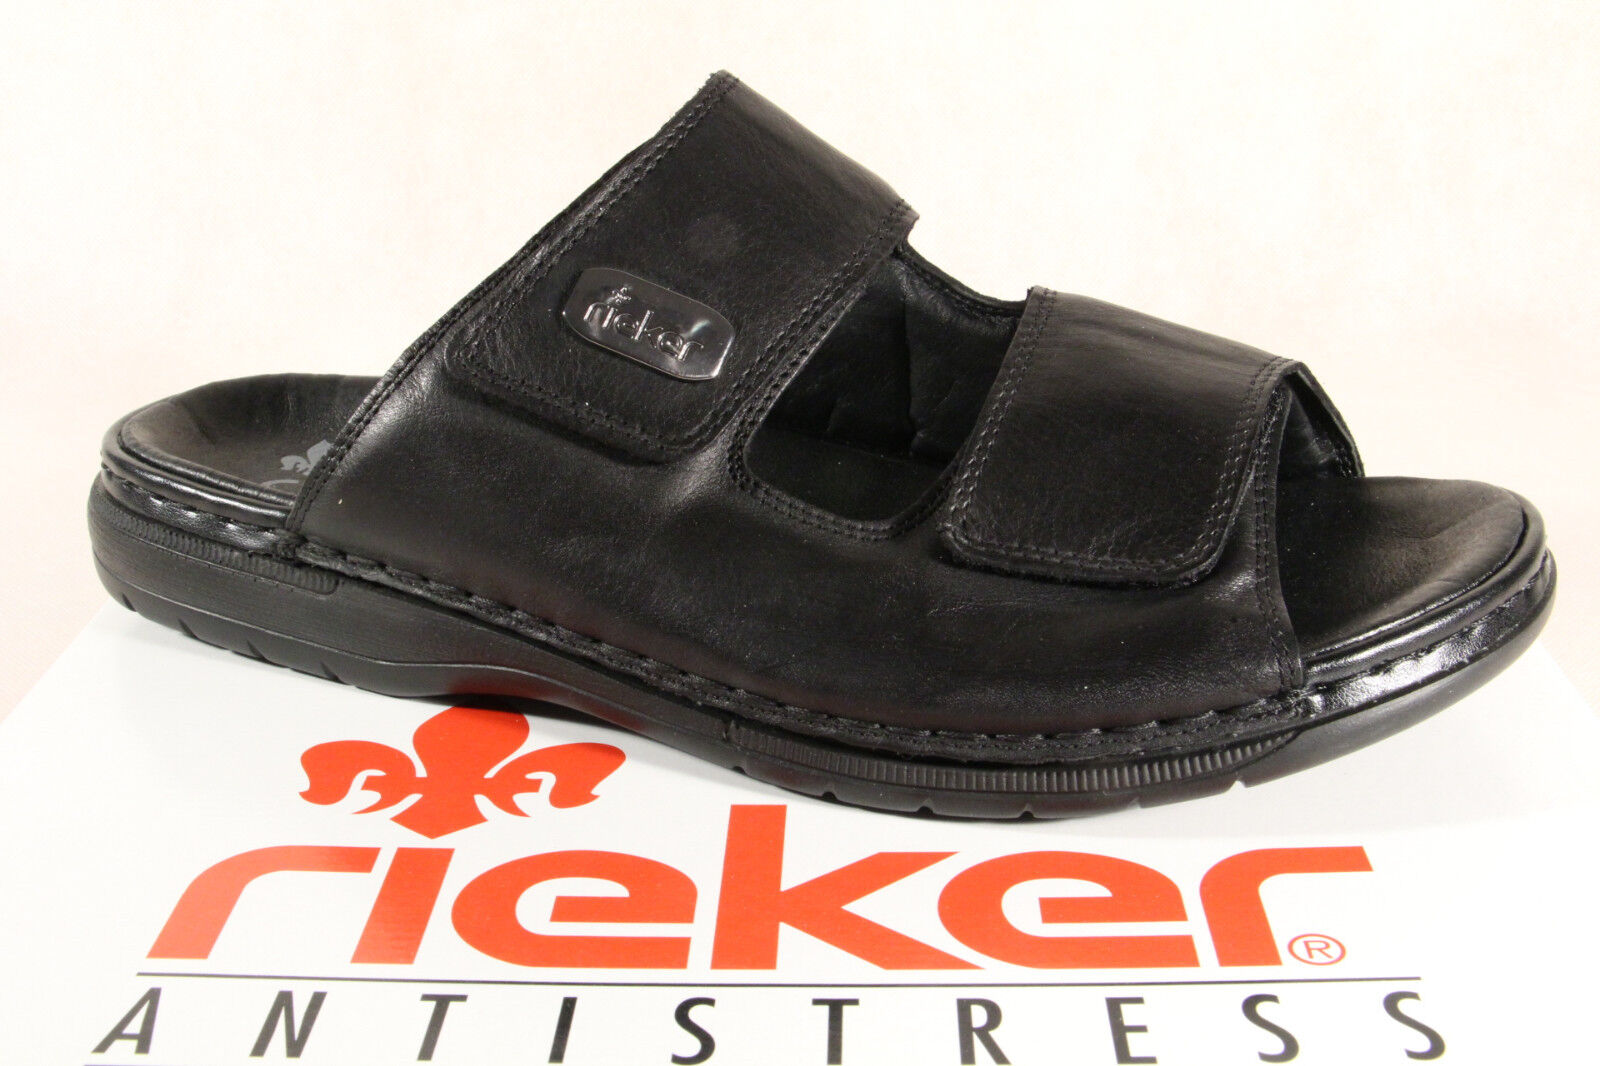 c03edd76e9e Mr/Ms Reef Phoenix Mens Sandal- Choose SZ/Color. Good design Affordable  Acknowledgement feedback,